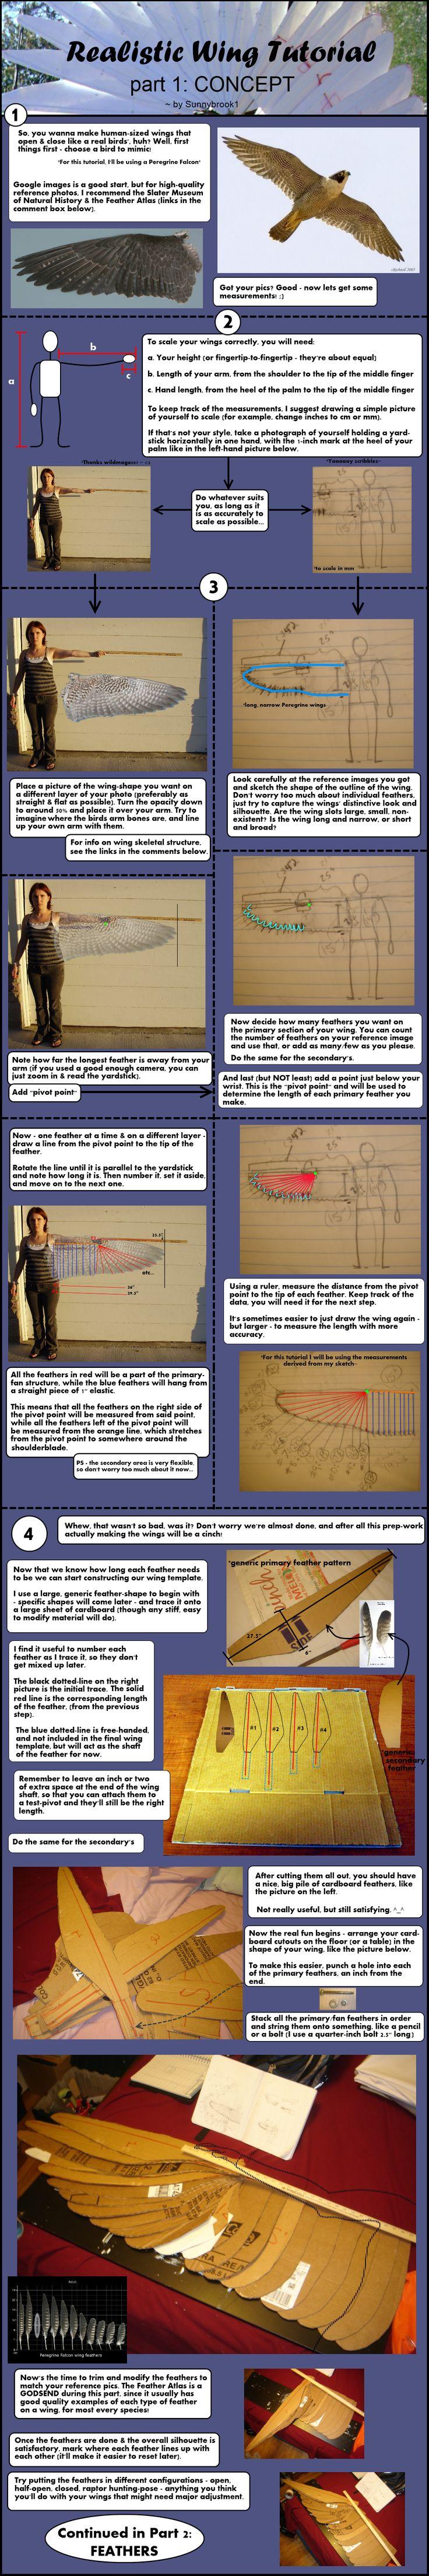 Realistic Wing Tutorial - P.1 by Sunnybrook1.deviantart.com on @deviantART